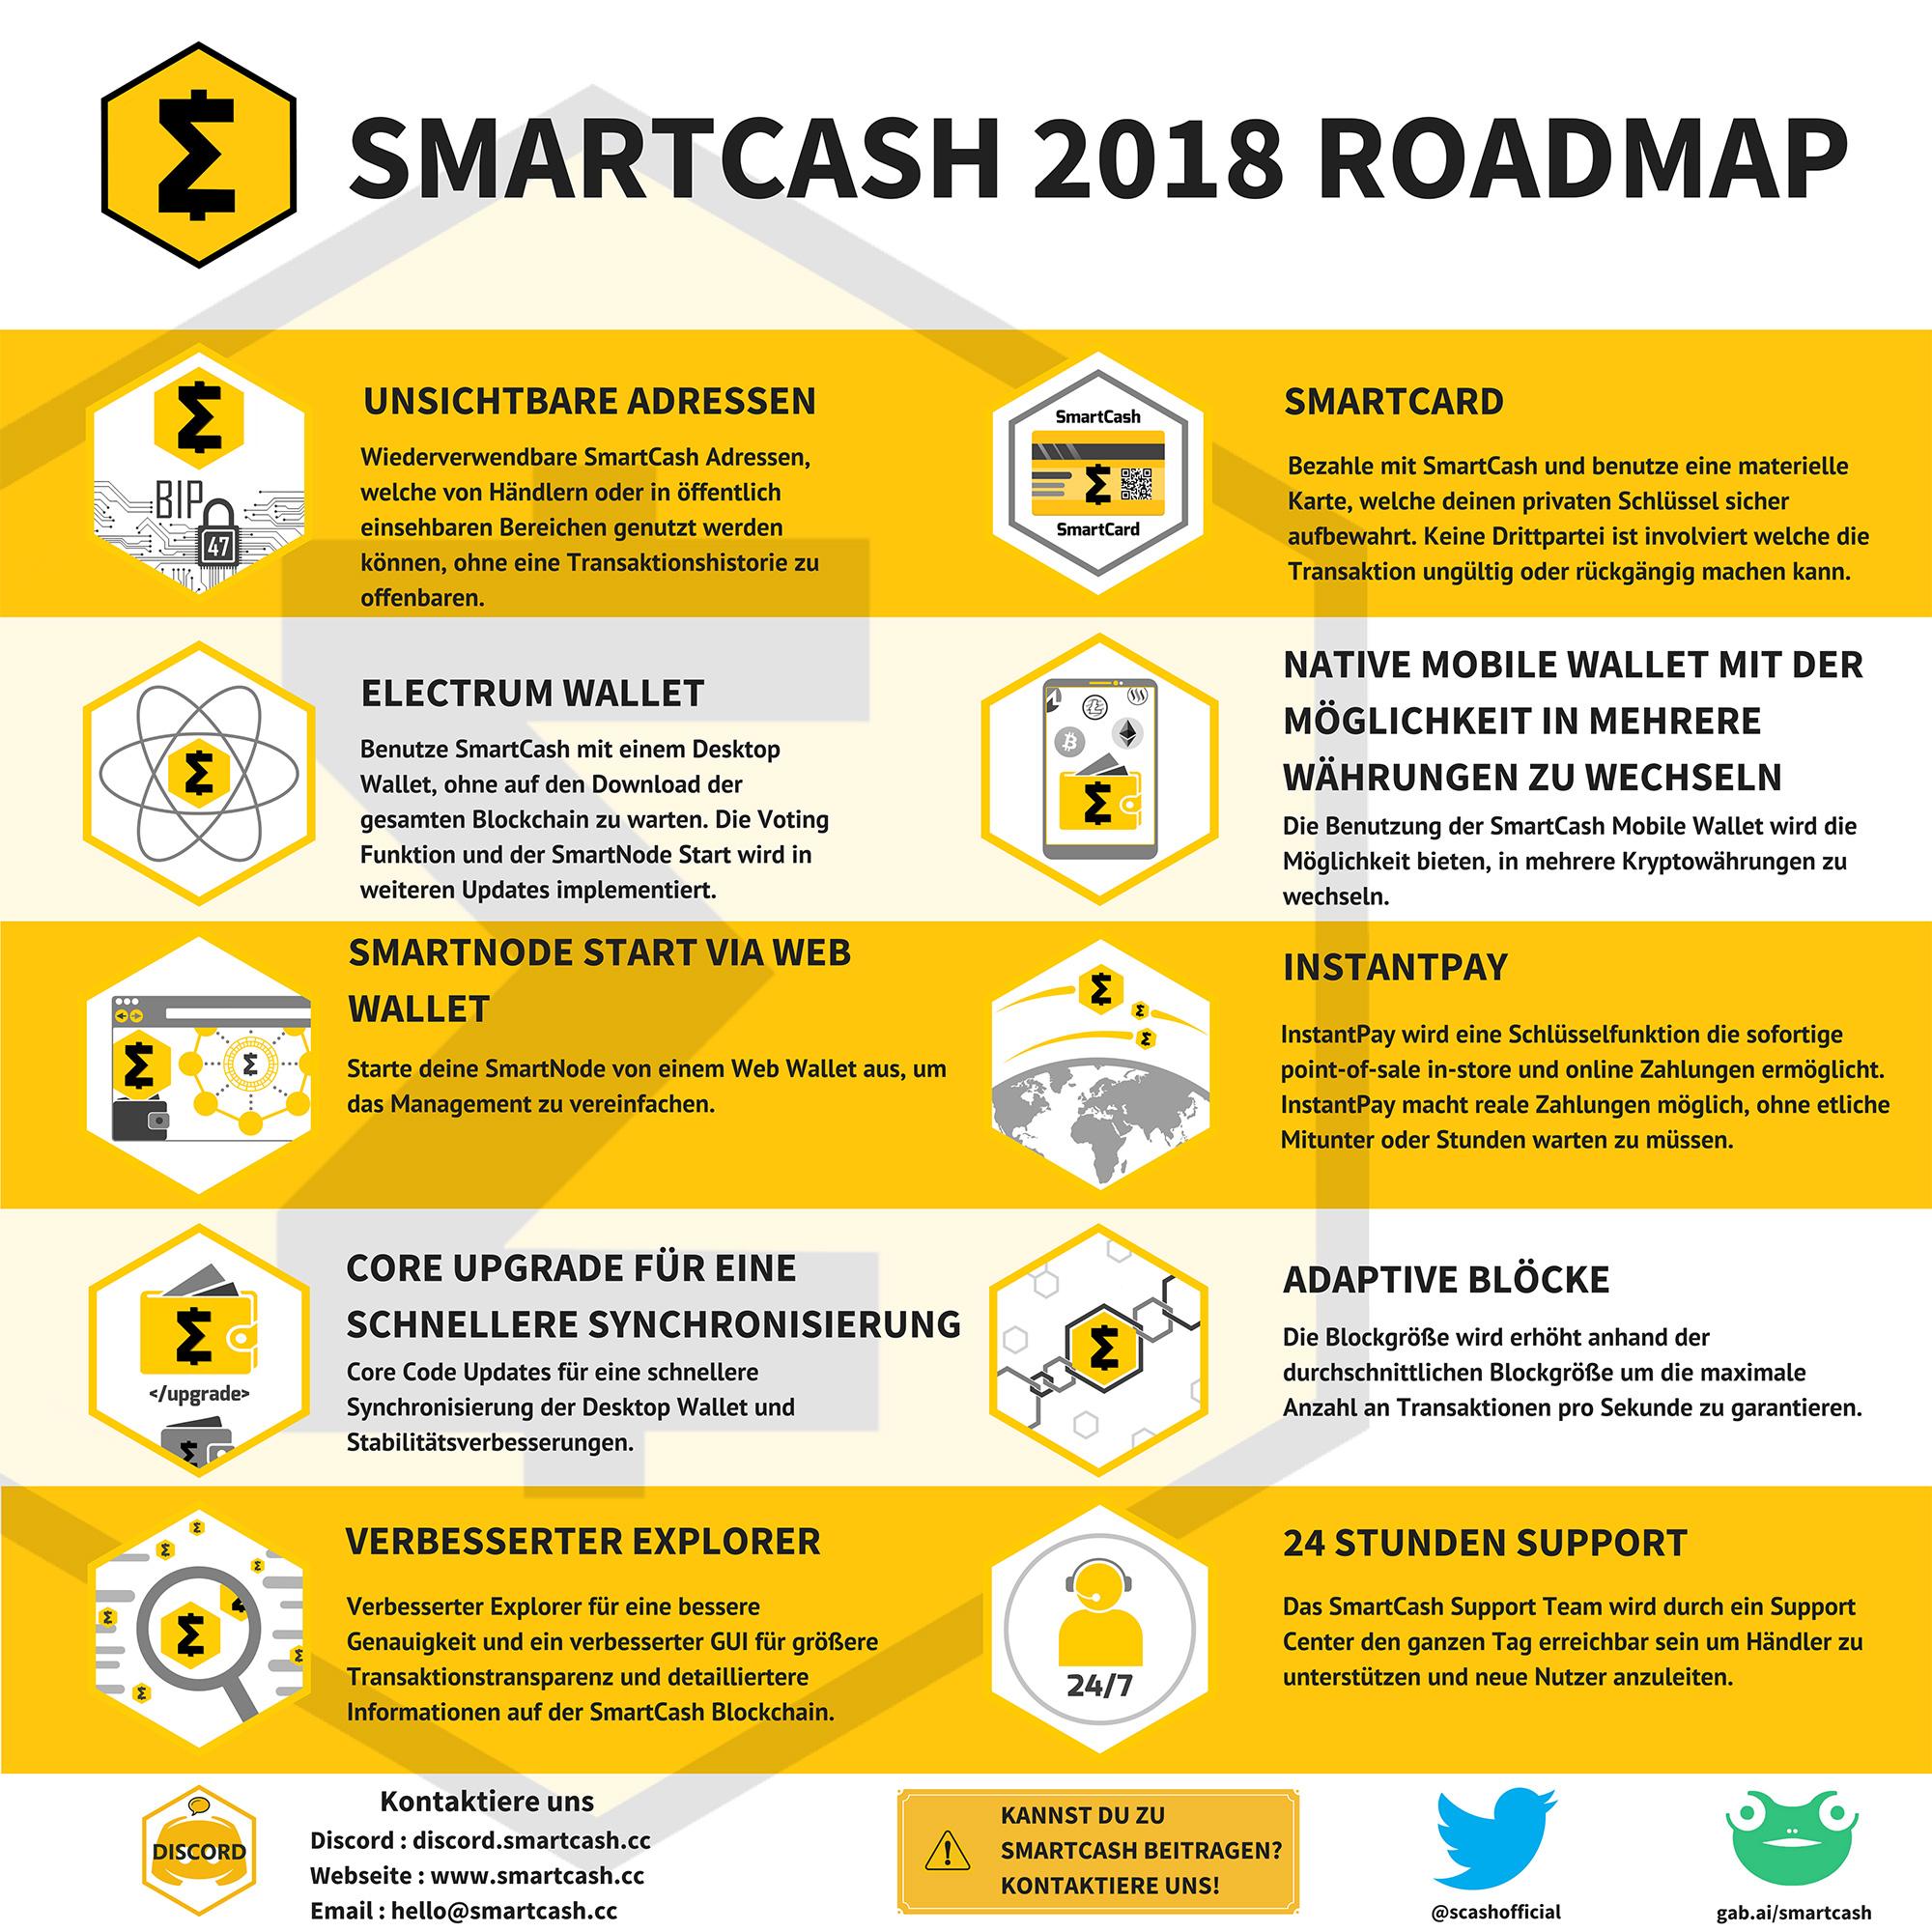 SmartCash-RoadMap-2018-German  smartcash